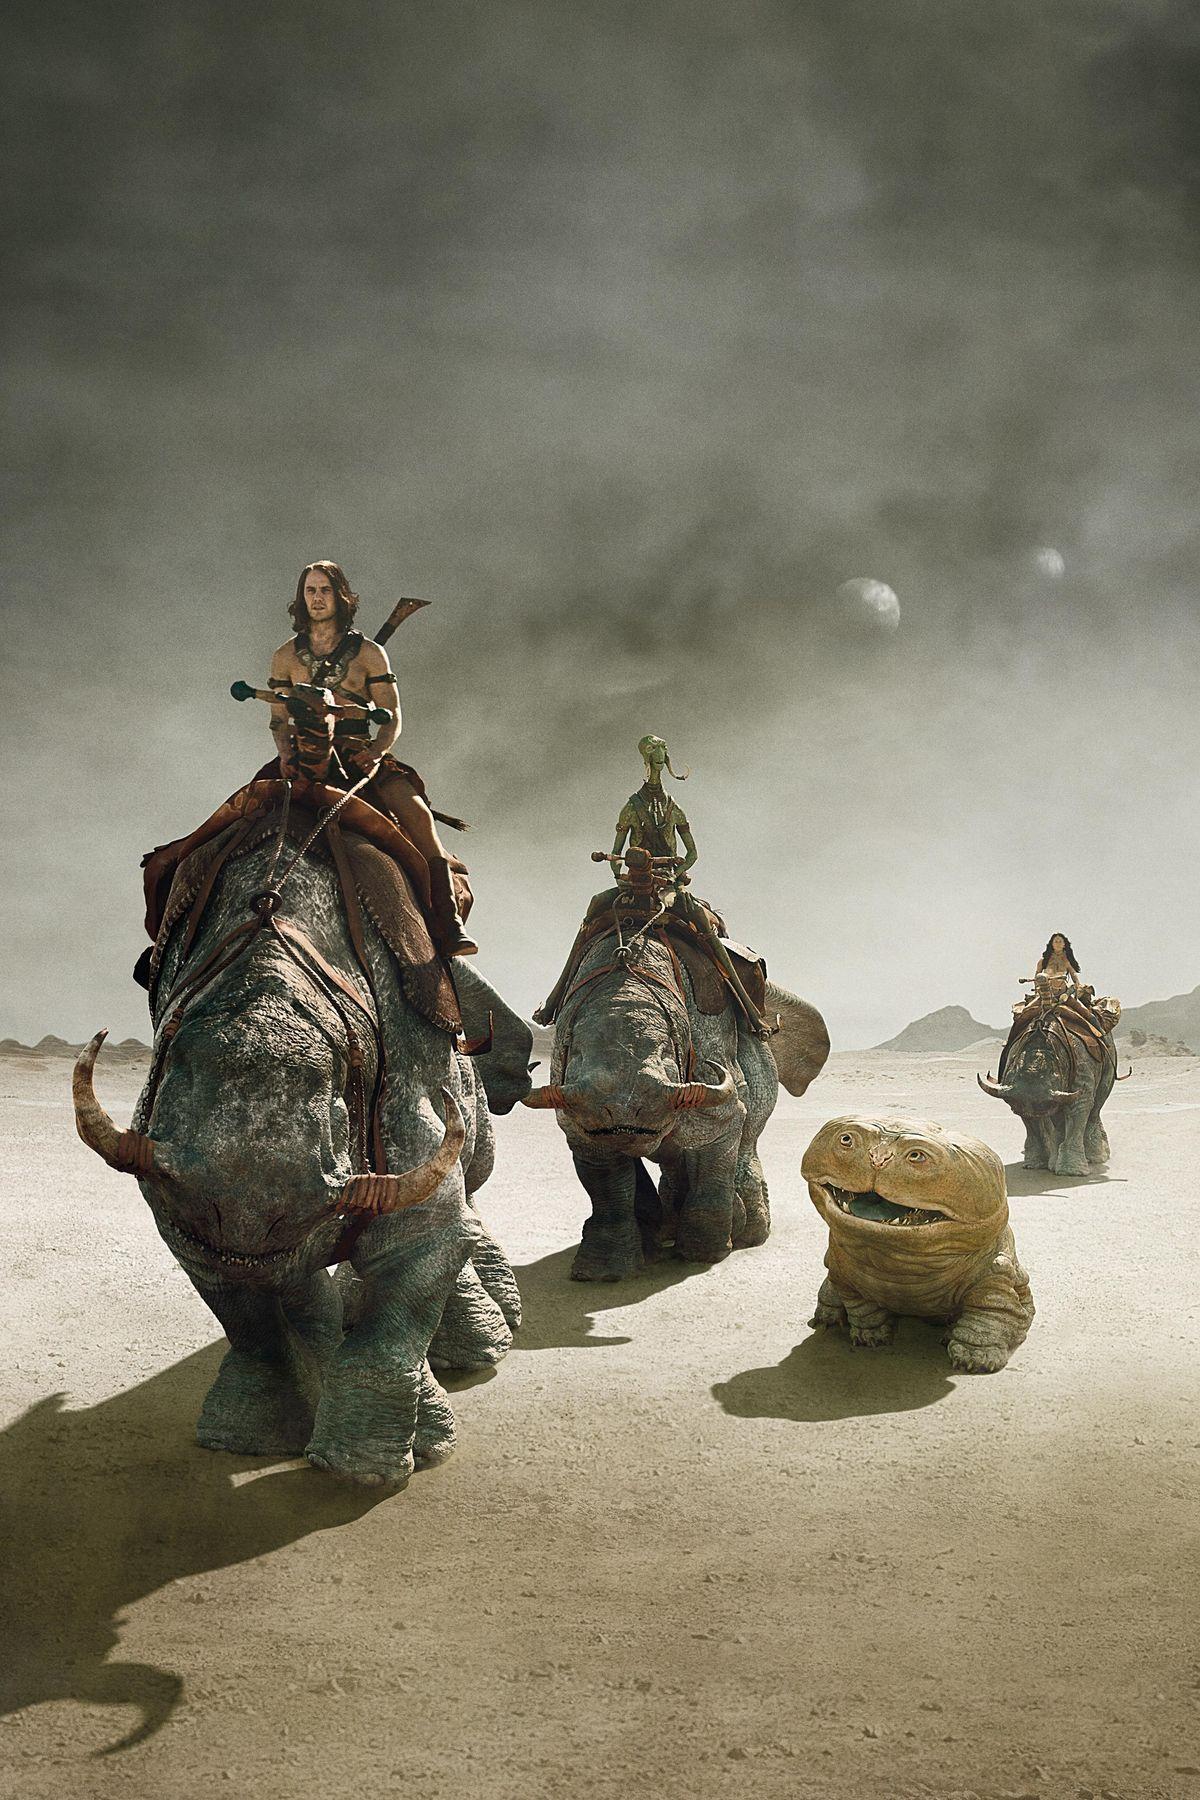 John Carter Streaming Vf : carter, streaming, Barsoom, Ideas, Carter, Mars,, Creature, Design,, Mythical, Creatures